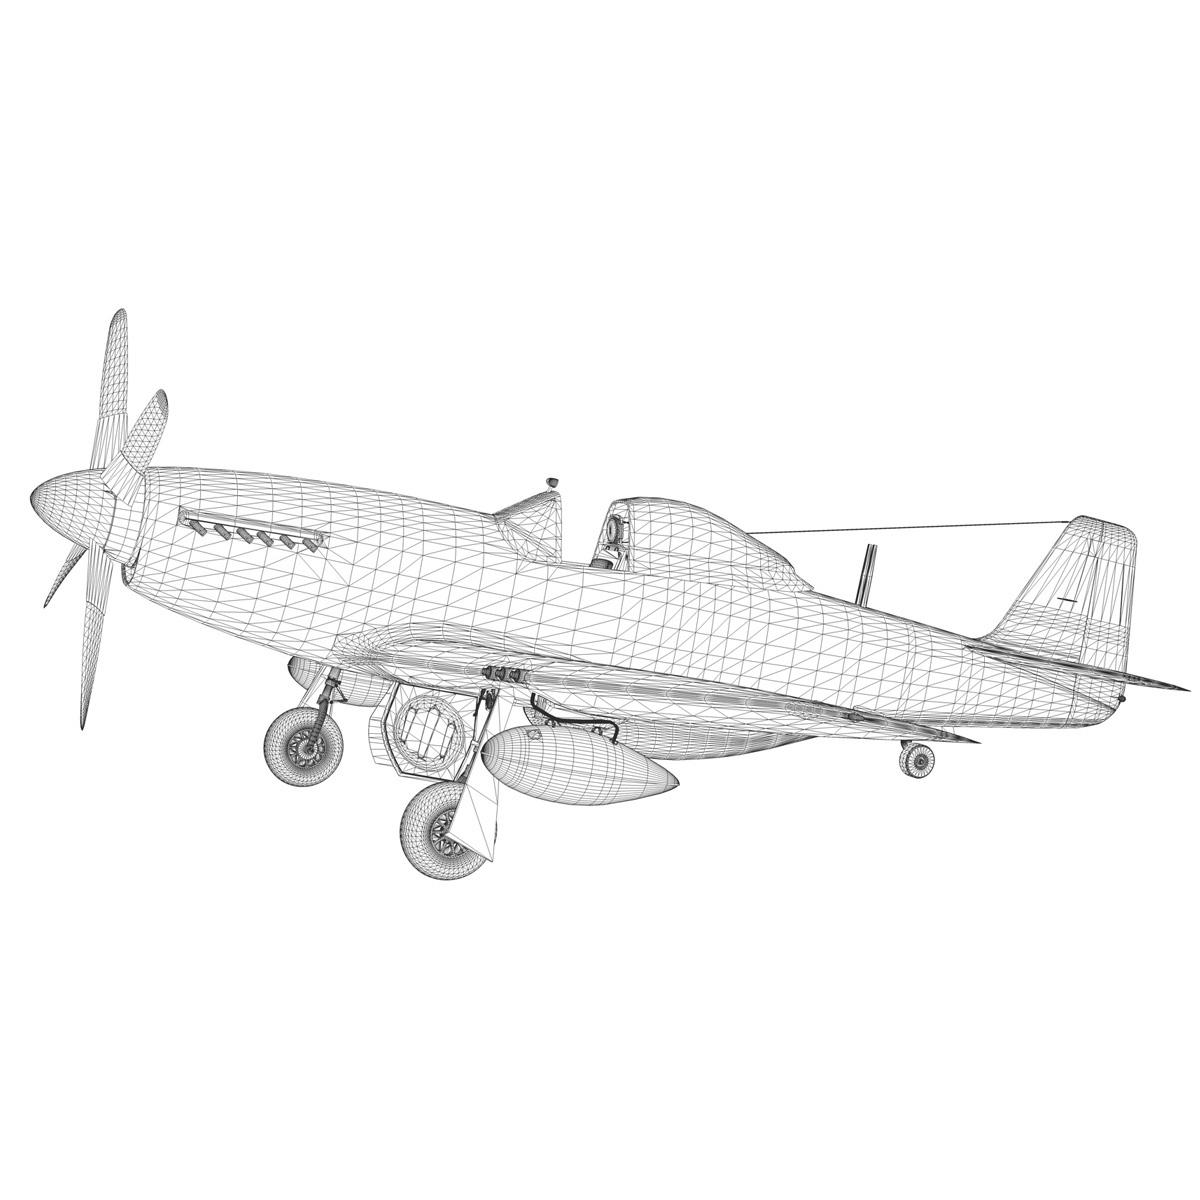 north american p-51d mustang – big beautiful doll 3d model fbx c4d lwo obj 282570